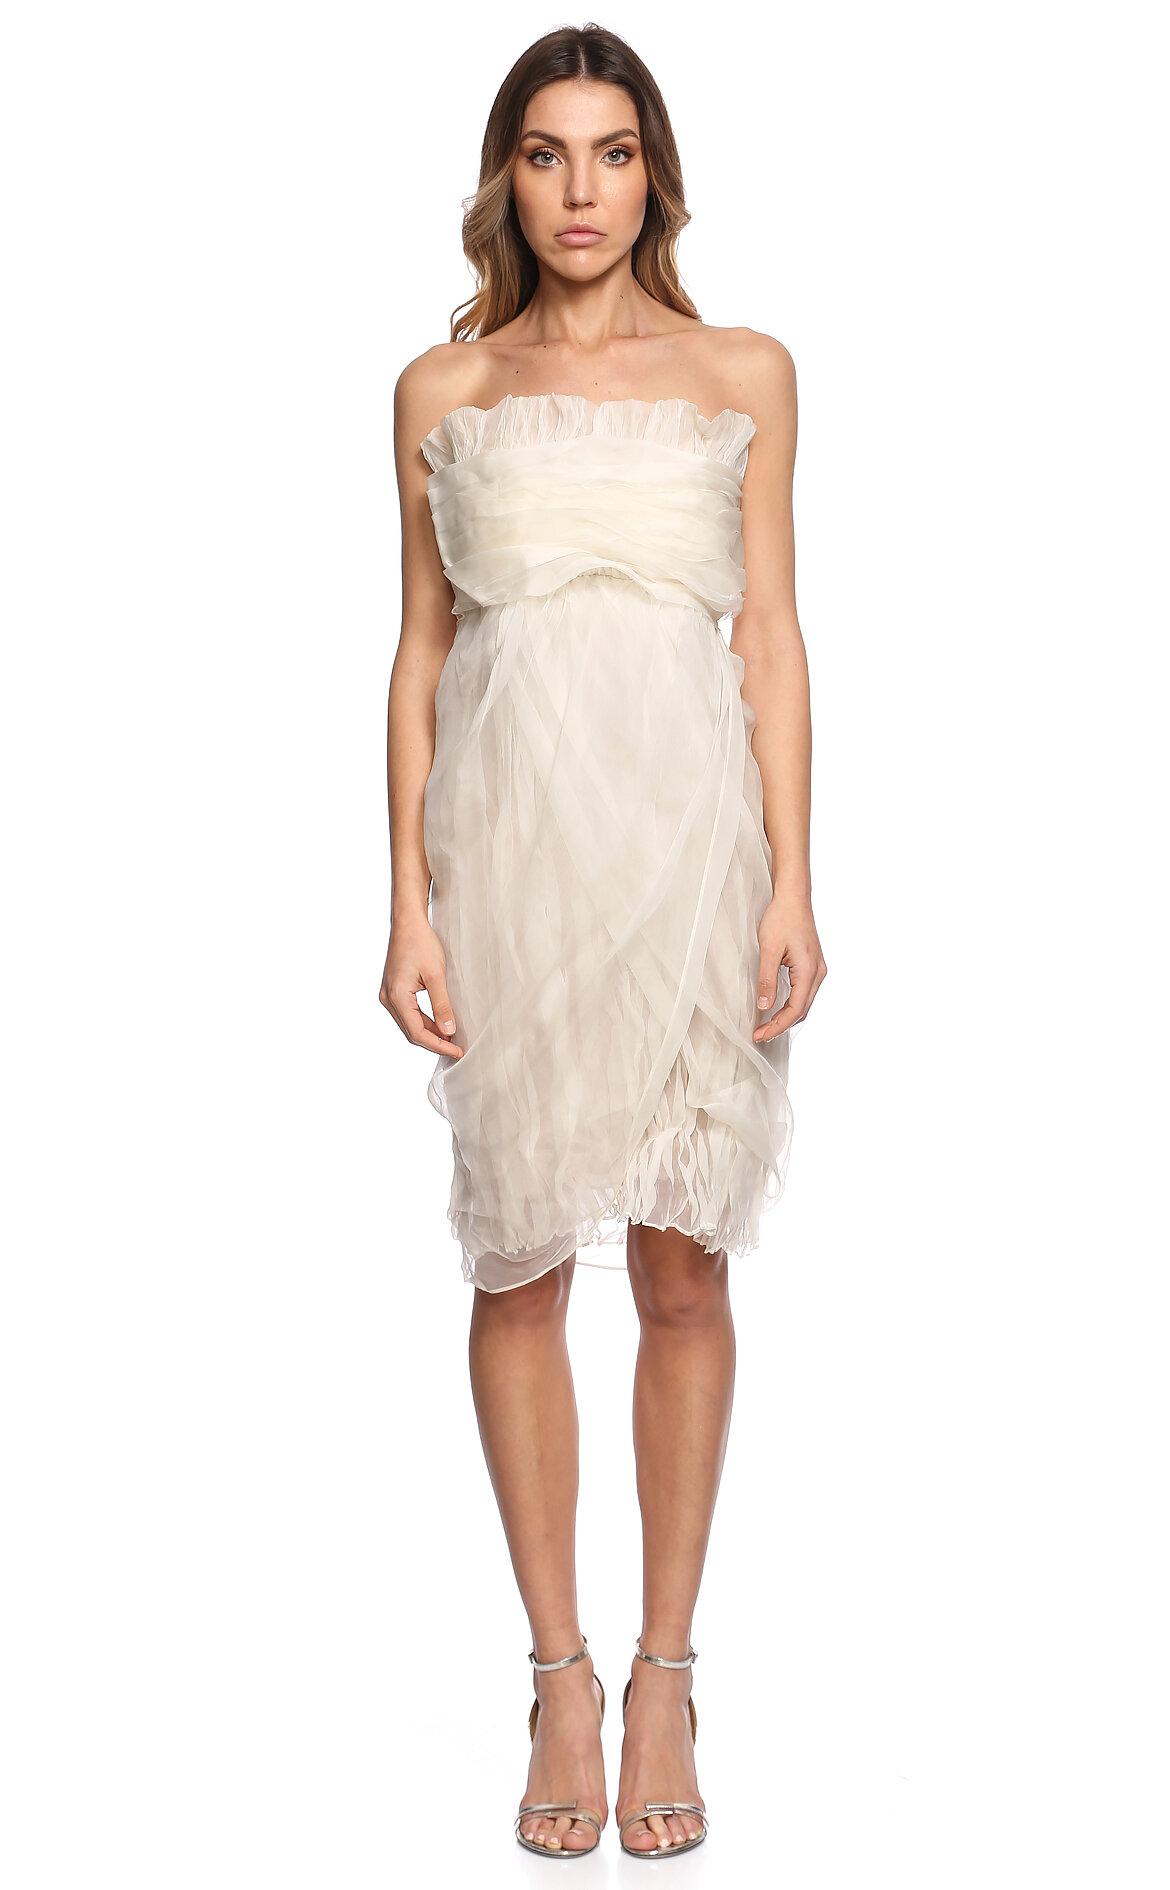 Gianfranco Ferre-Gianfranco Ferre Straplez Beyaz Elbise